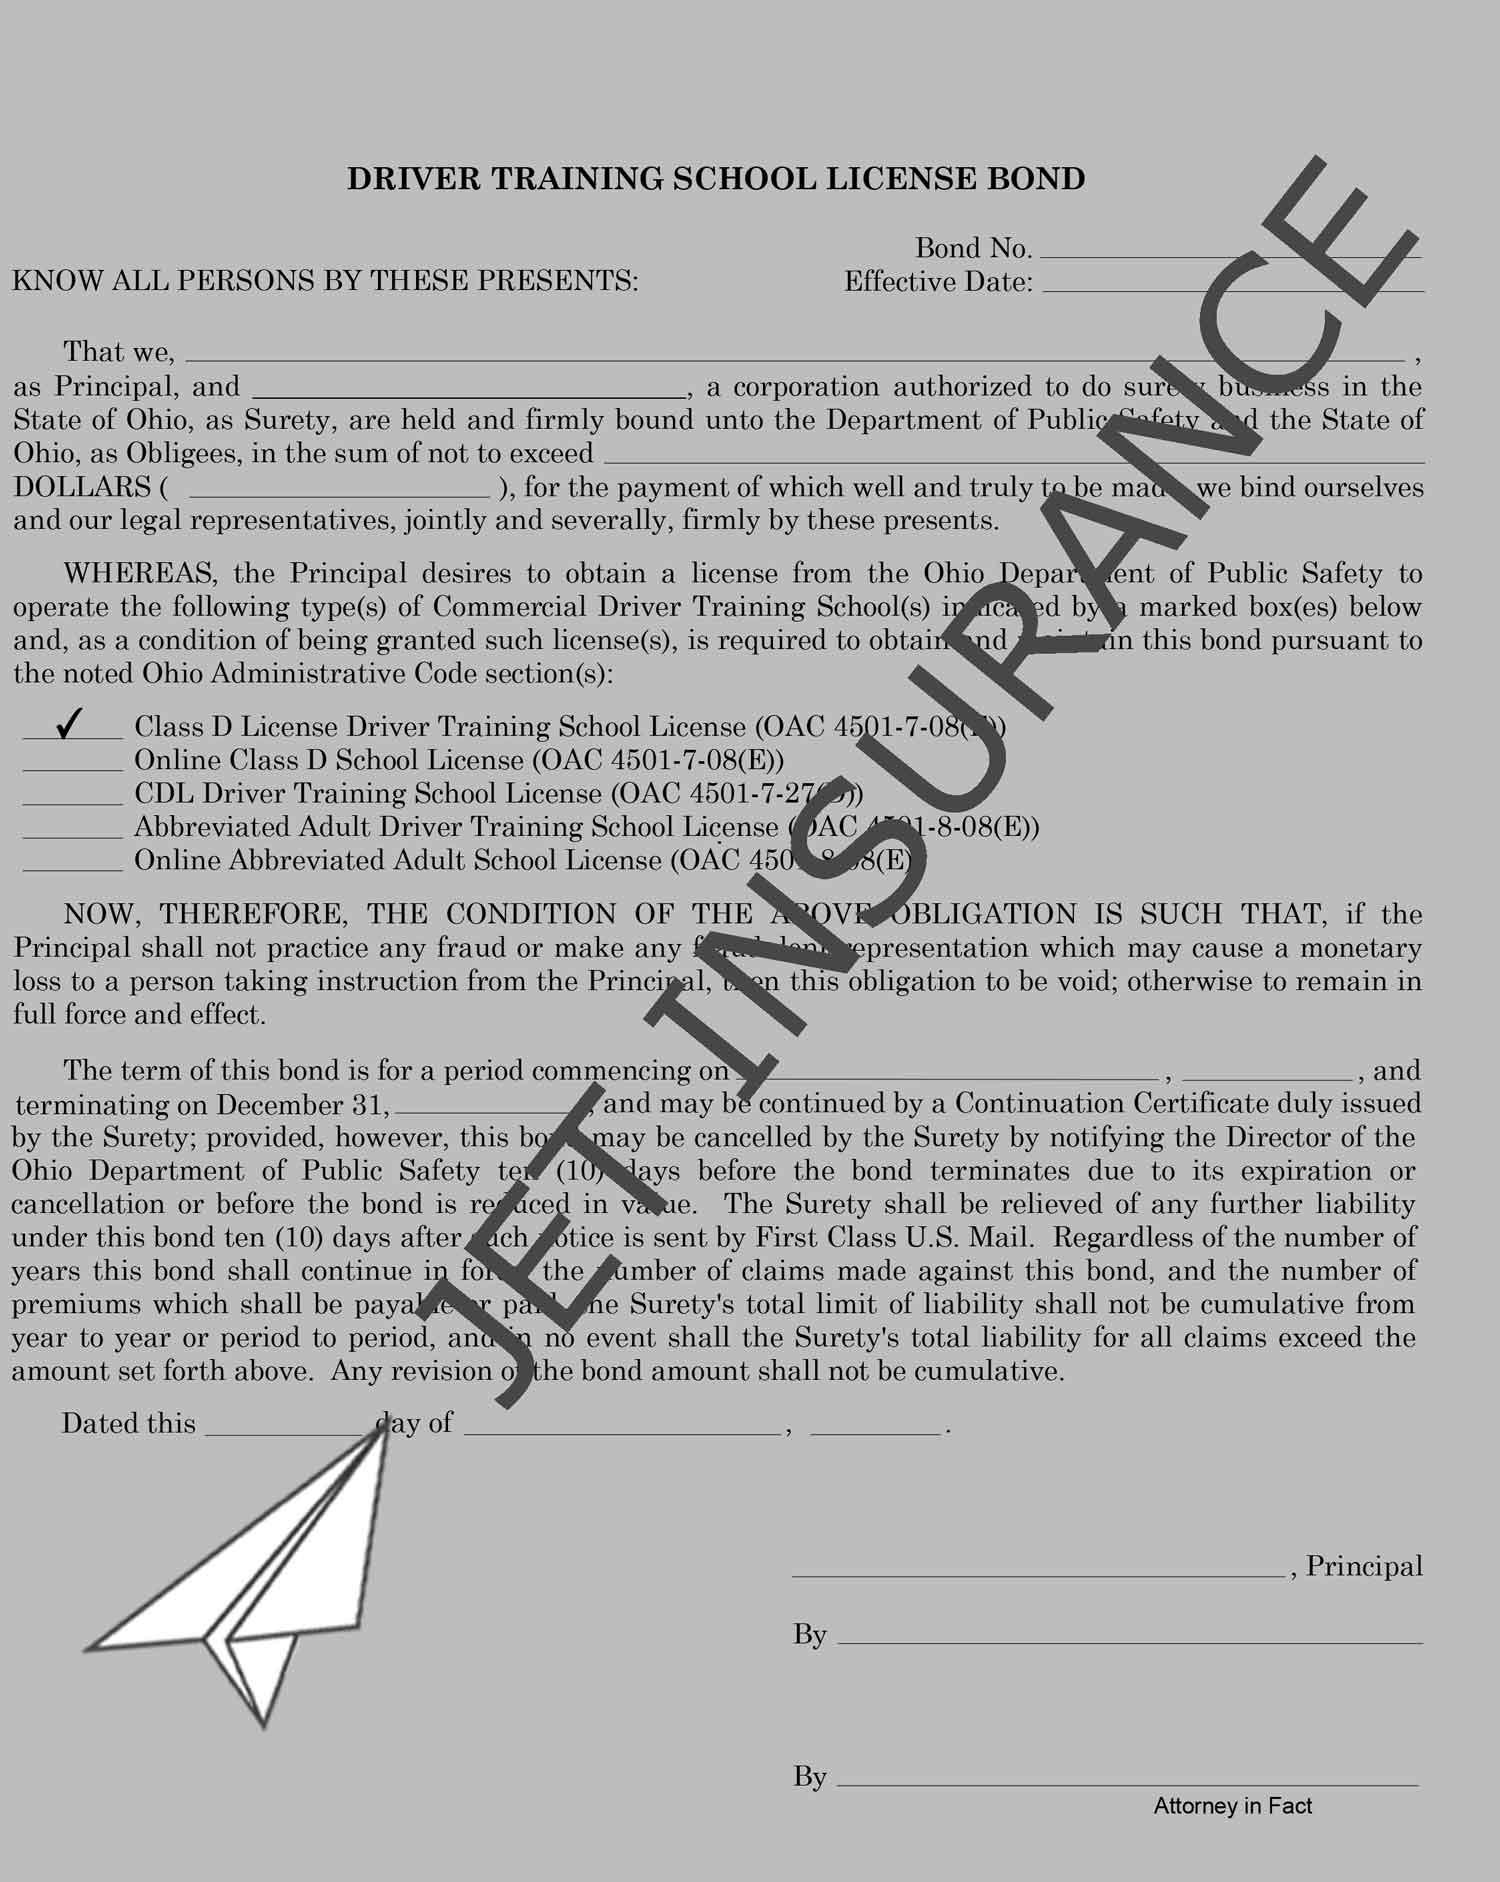 Ohio Driver Training and Testing License Bond Form